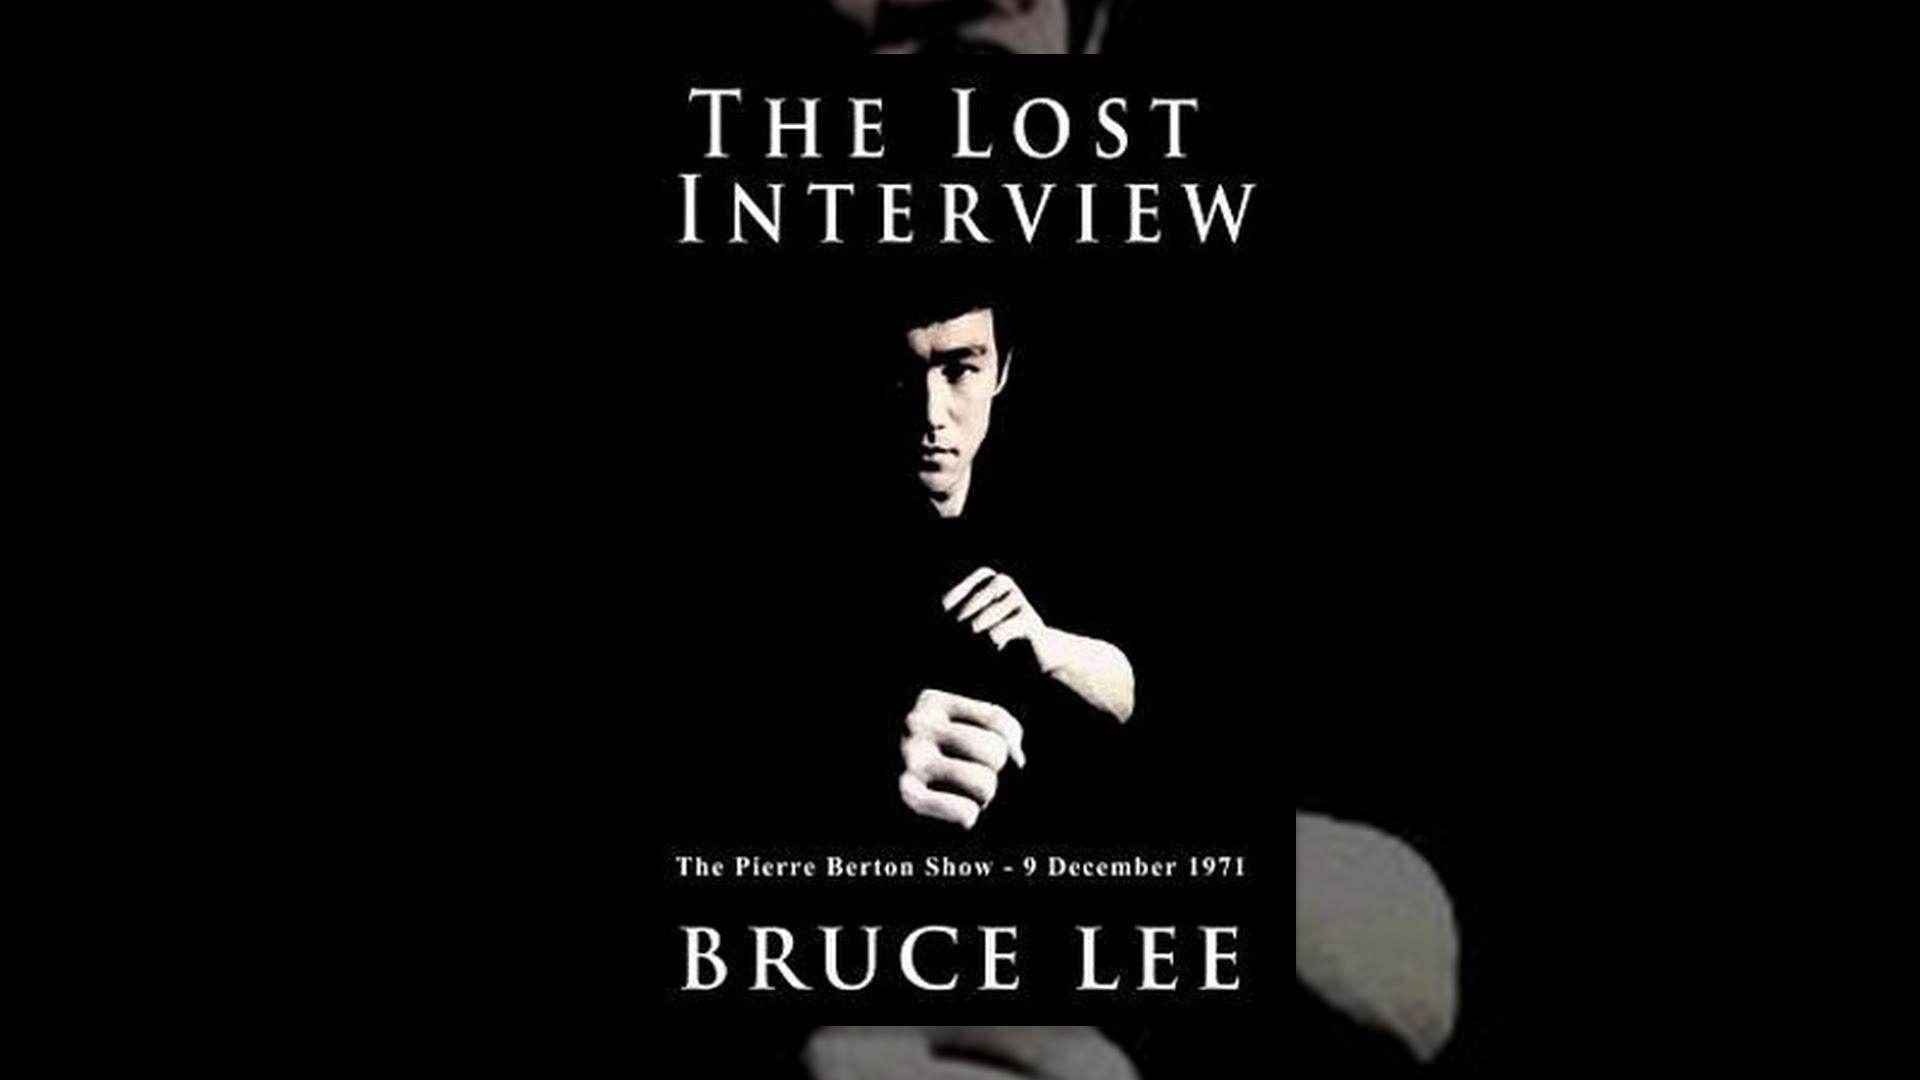 BRUCE LEE, THE LOST INTERVIEW - full movie / EN